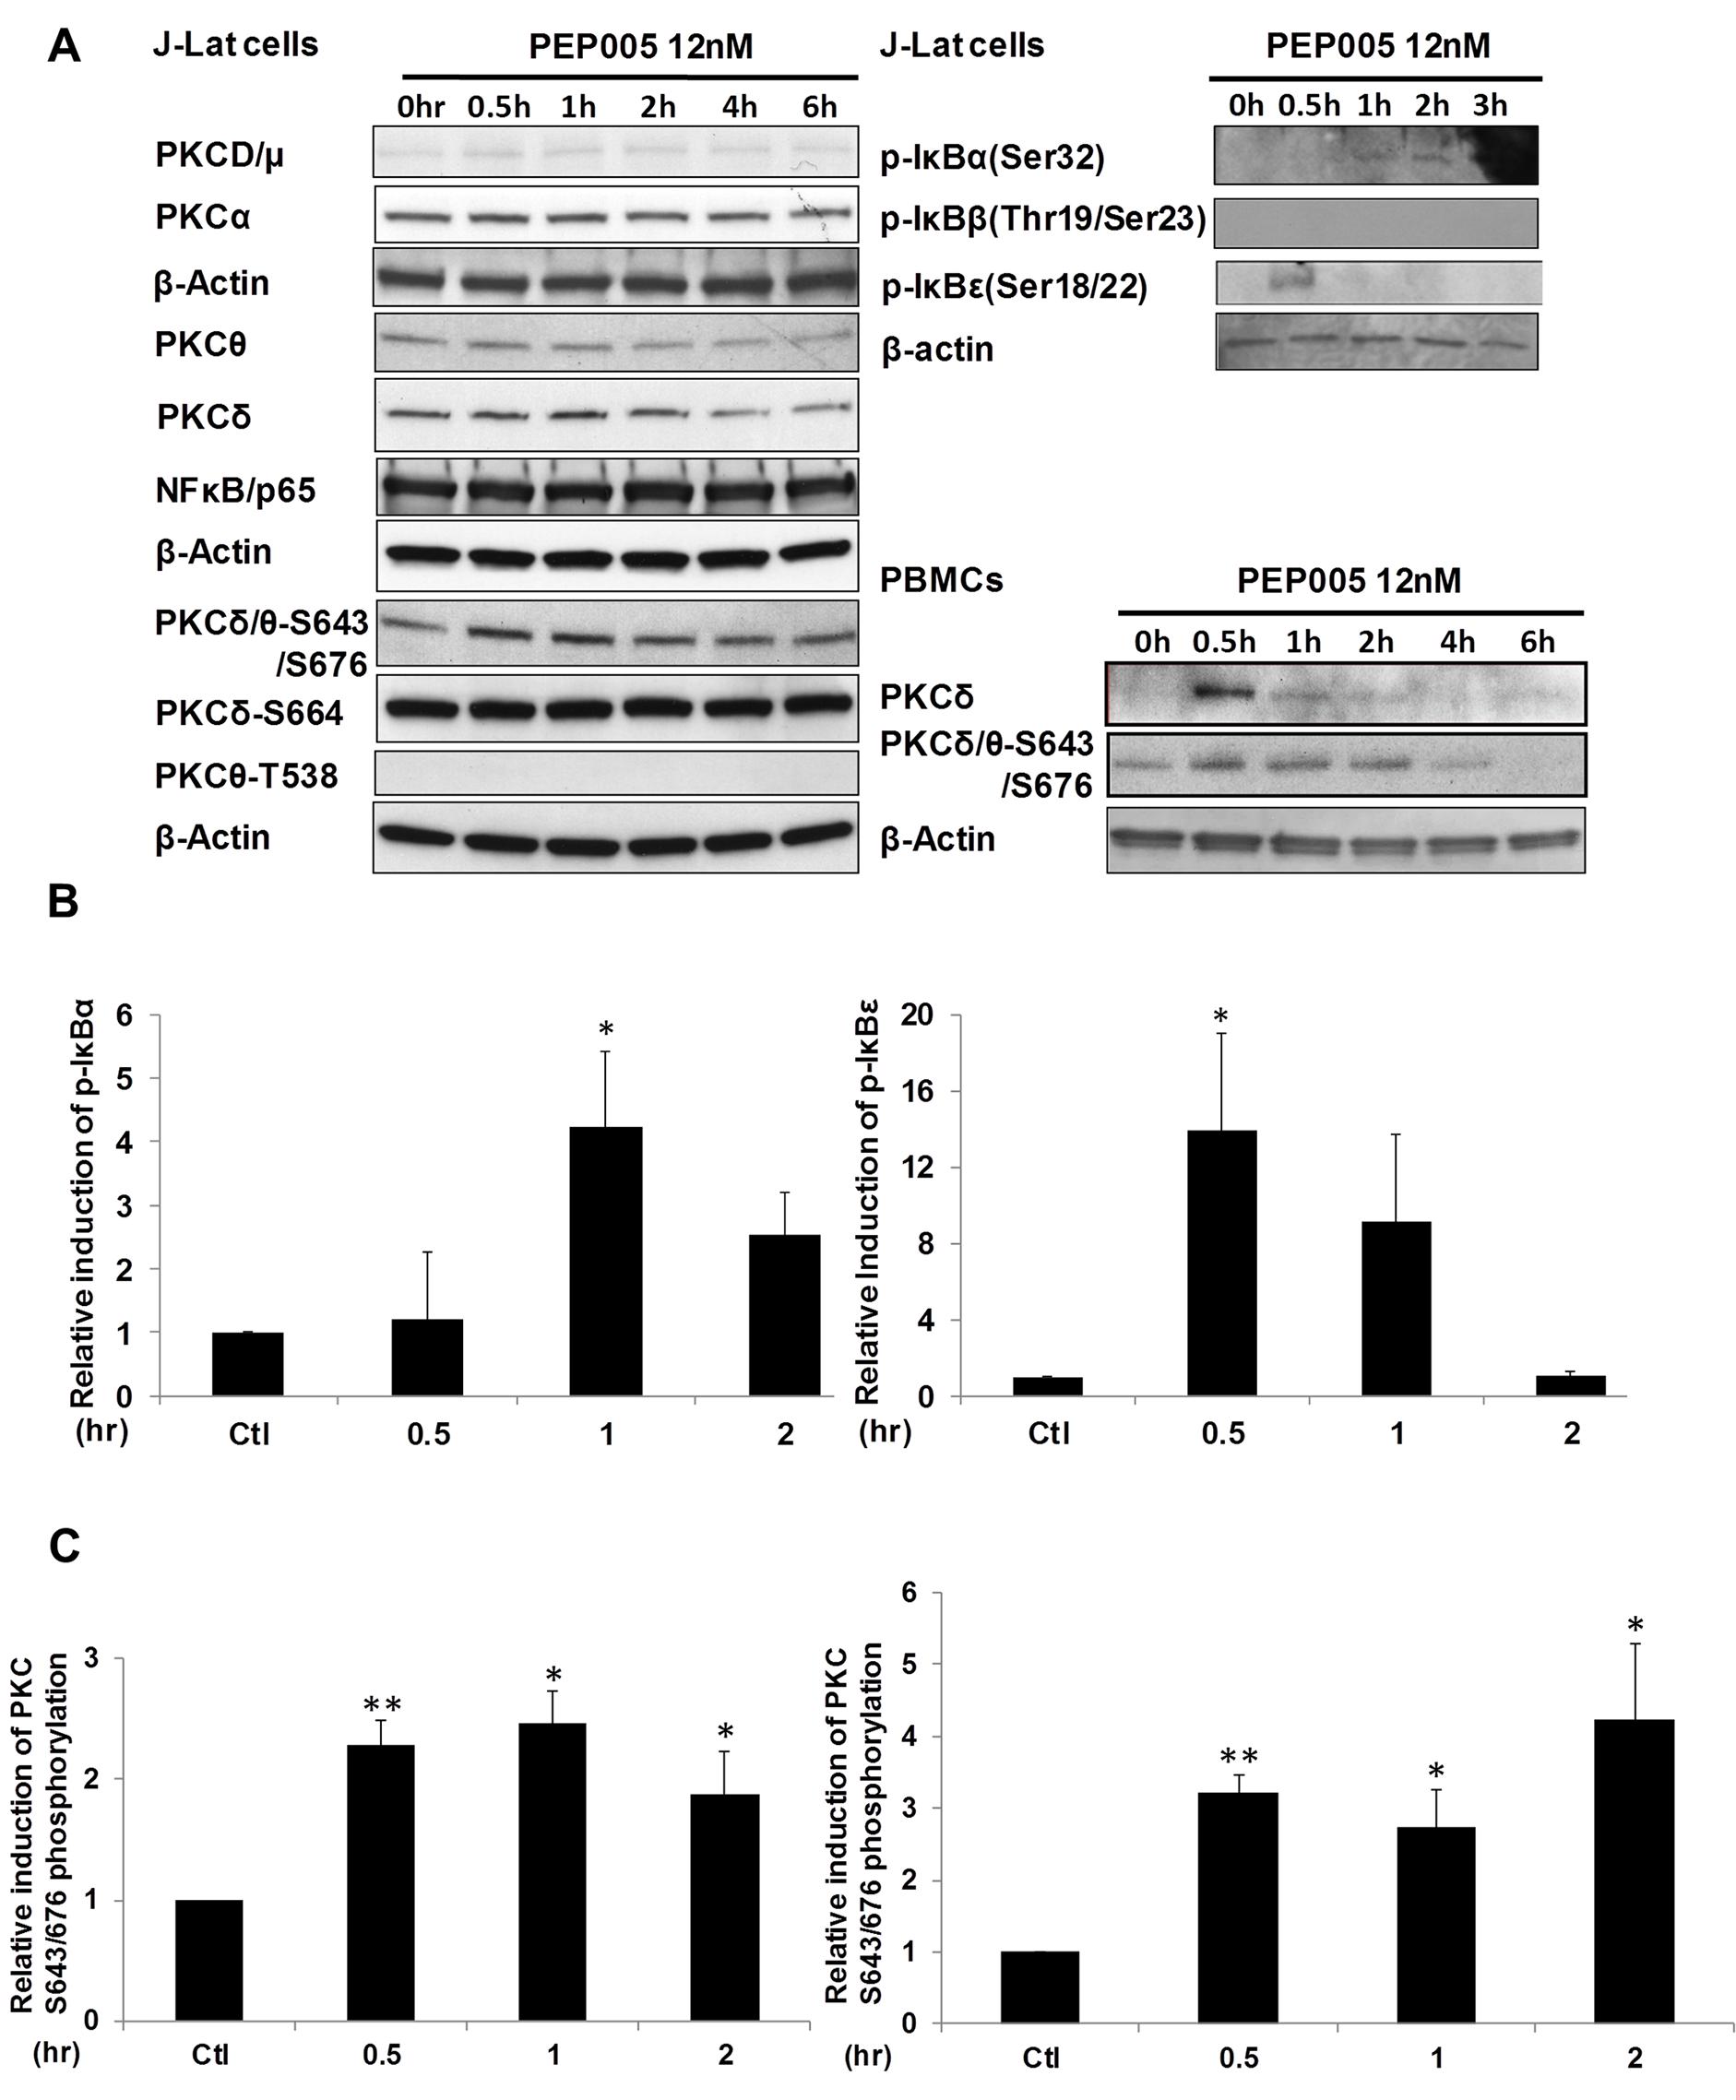 PEP005 activates PKCδ/θ-IκBα/ε-NF-ĸB signaling.